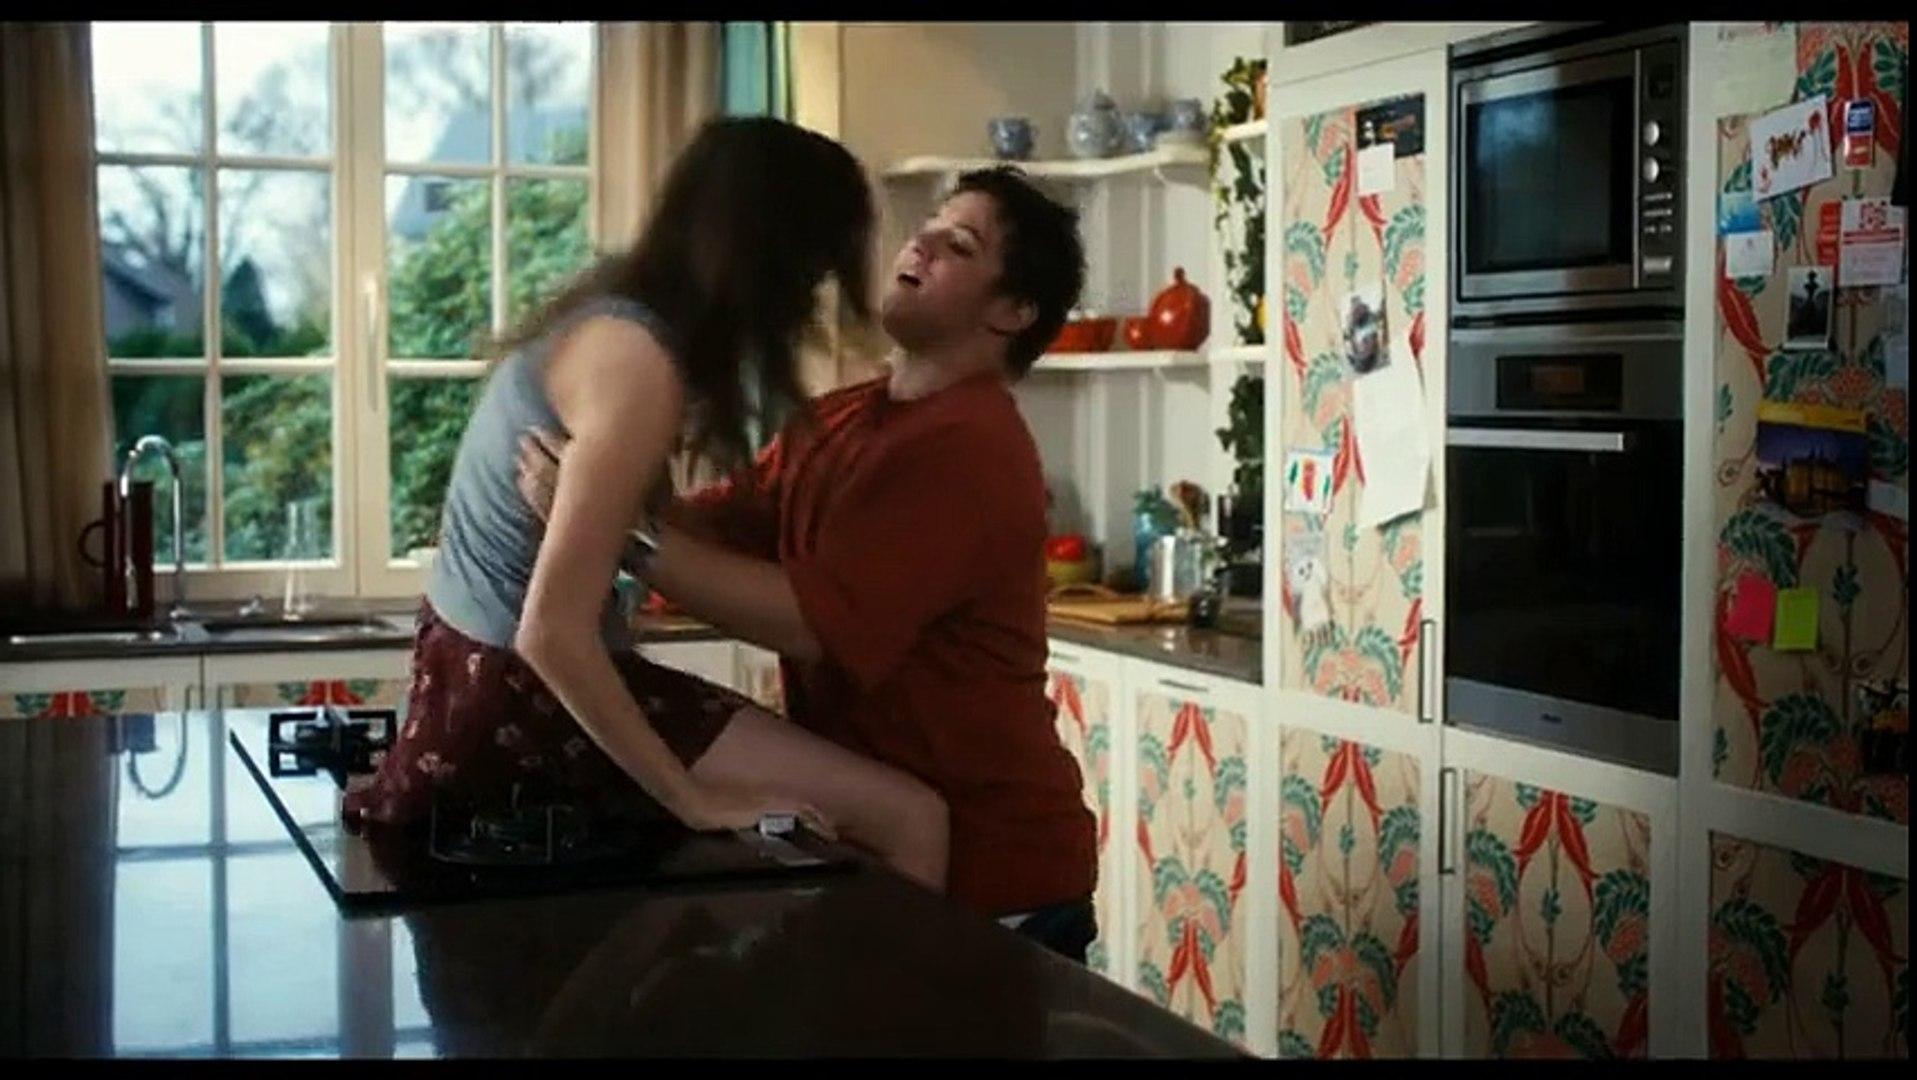 Second Chance / La Chance de ma vie (2011) - Trailer